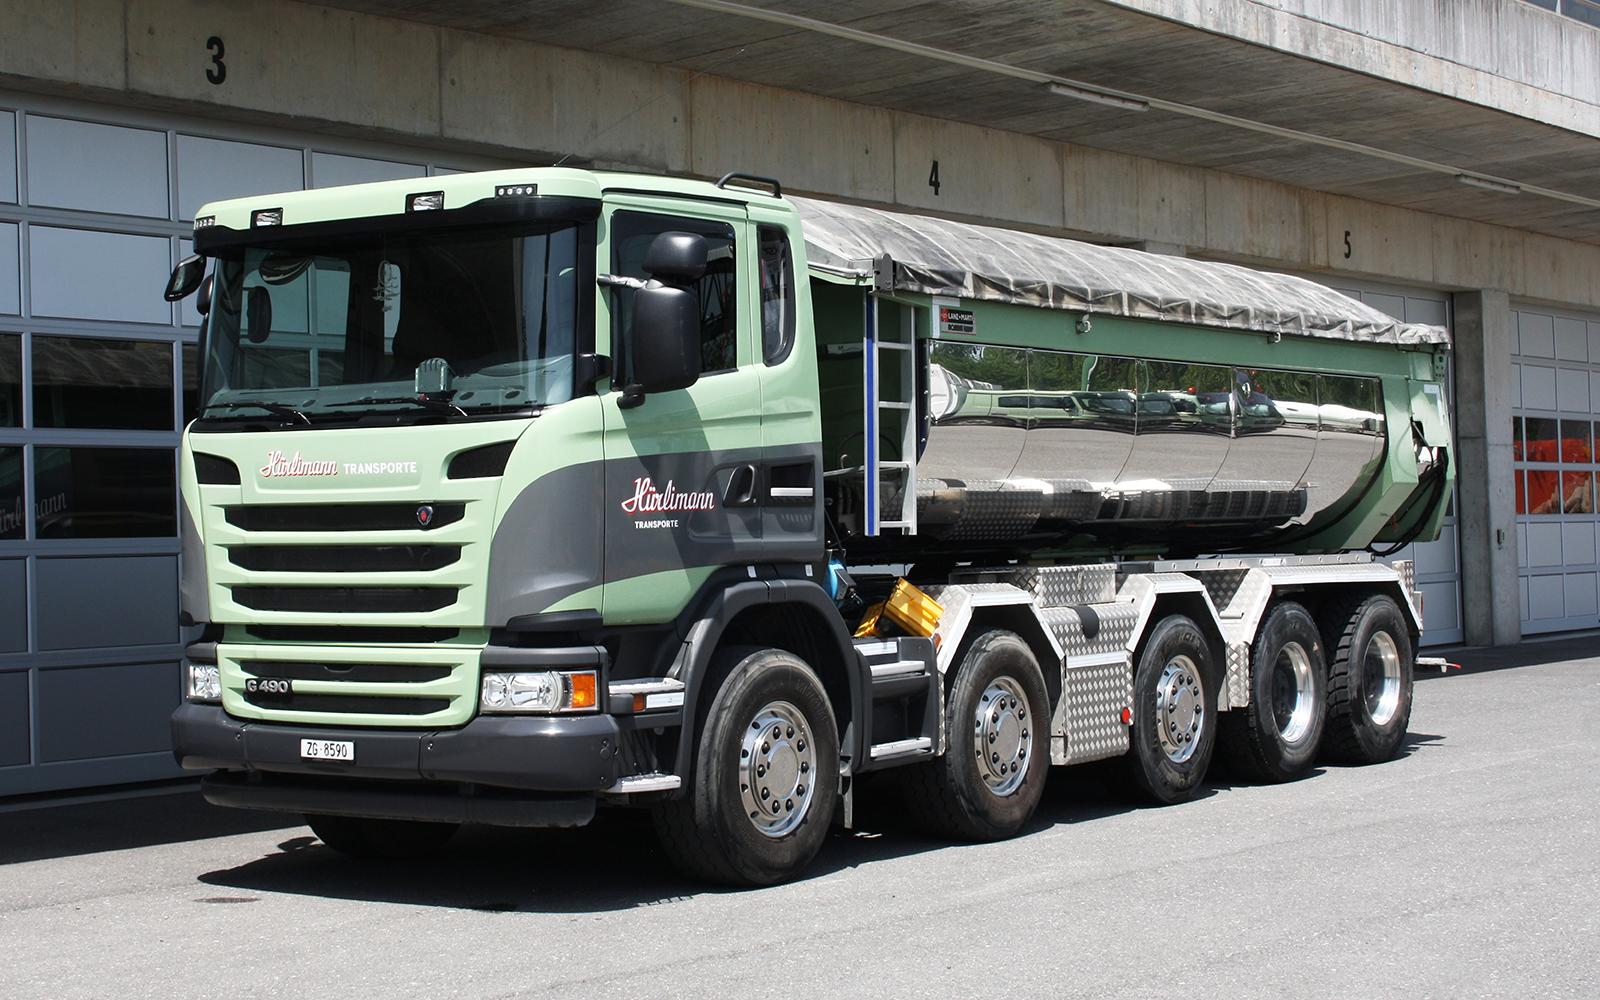 Huerlimann-Scania5AKT_1600x1000px_1